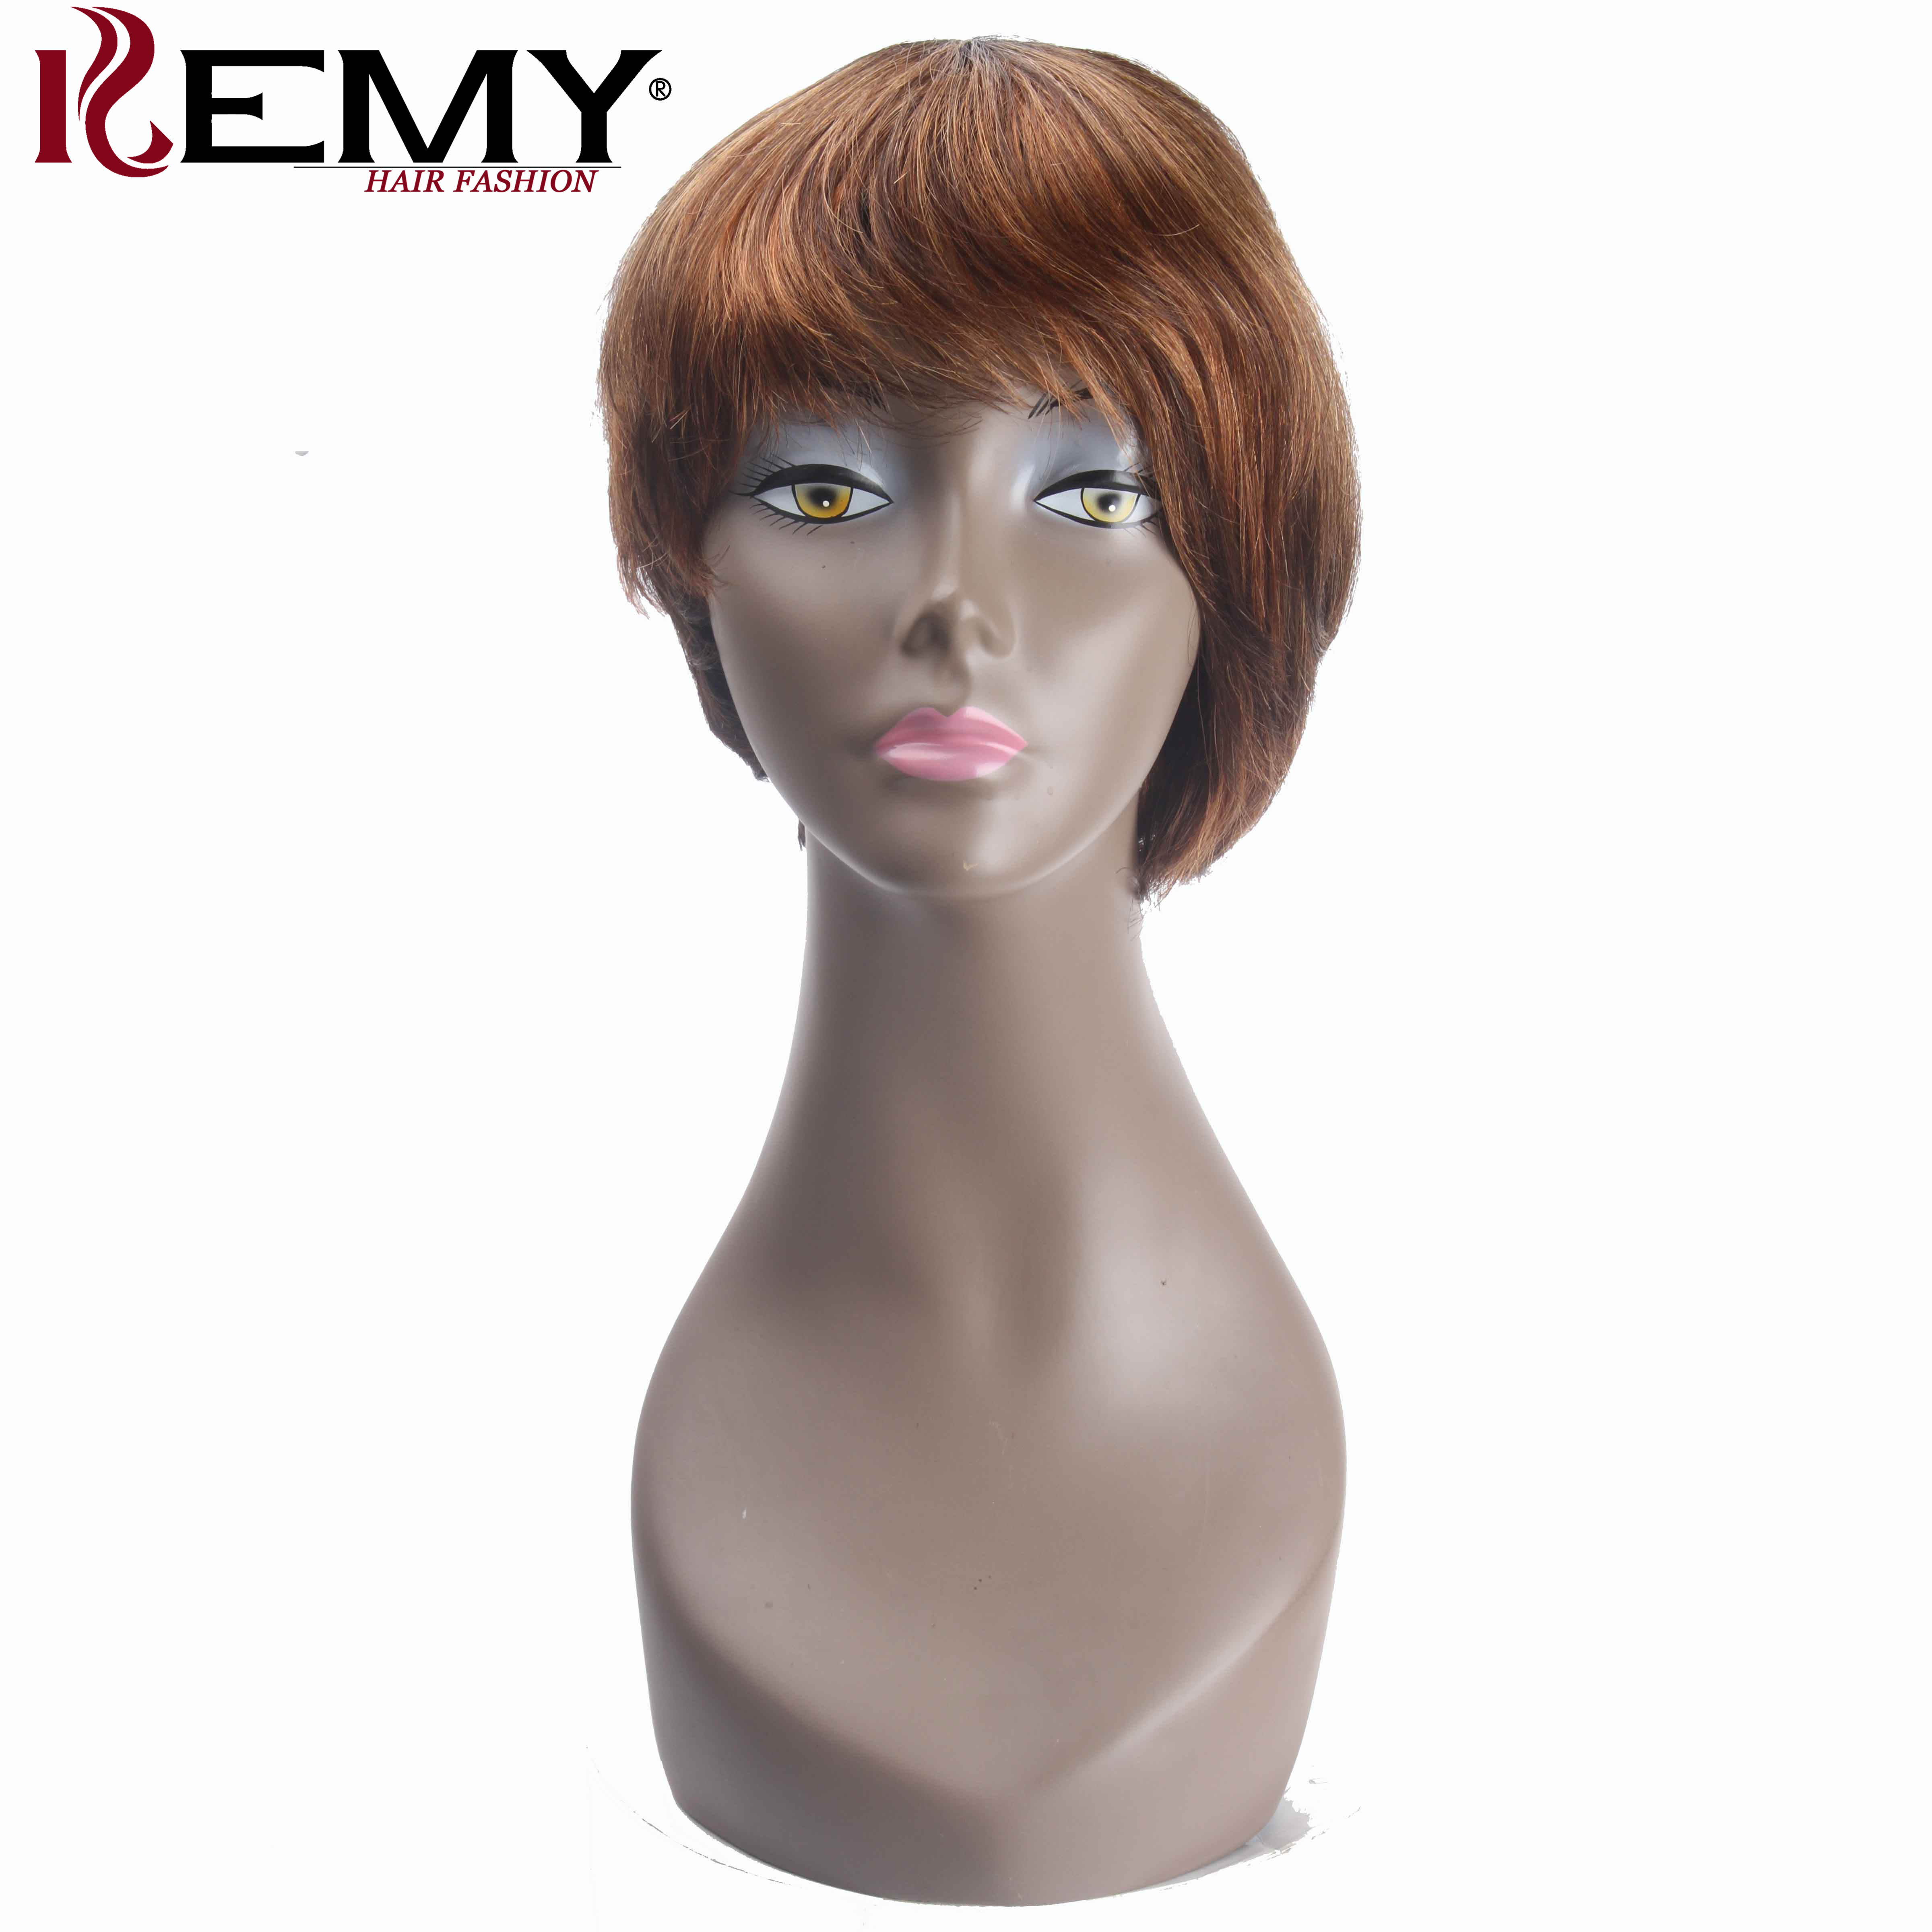 Brazilian Straight Human Hair Wigs Non-Remy Black Brown Human Hair Wigs For Black Women All Machine Made Short Bob Wig KEMY HAIR